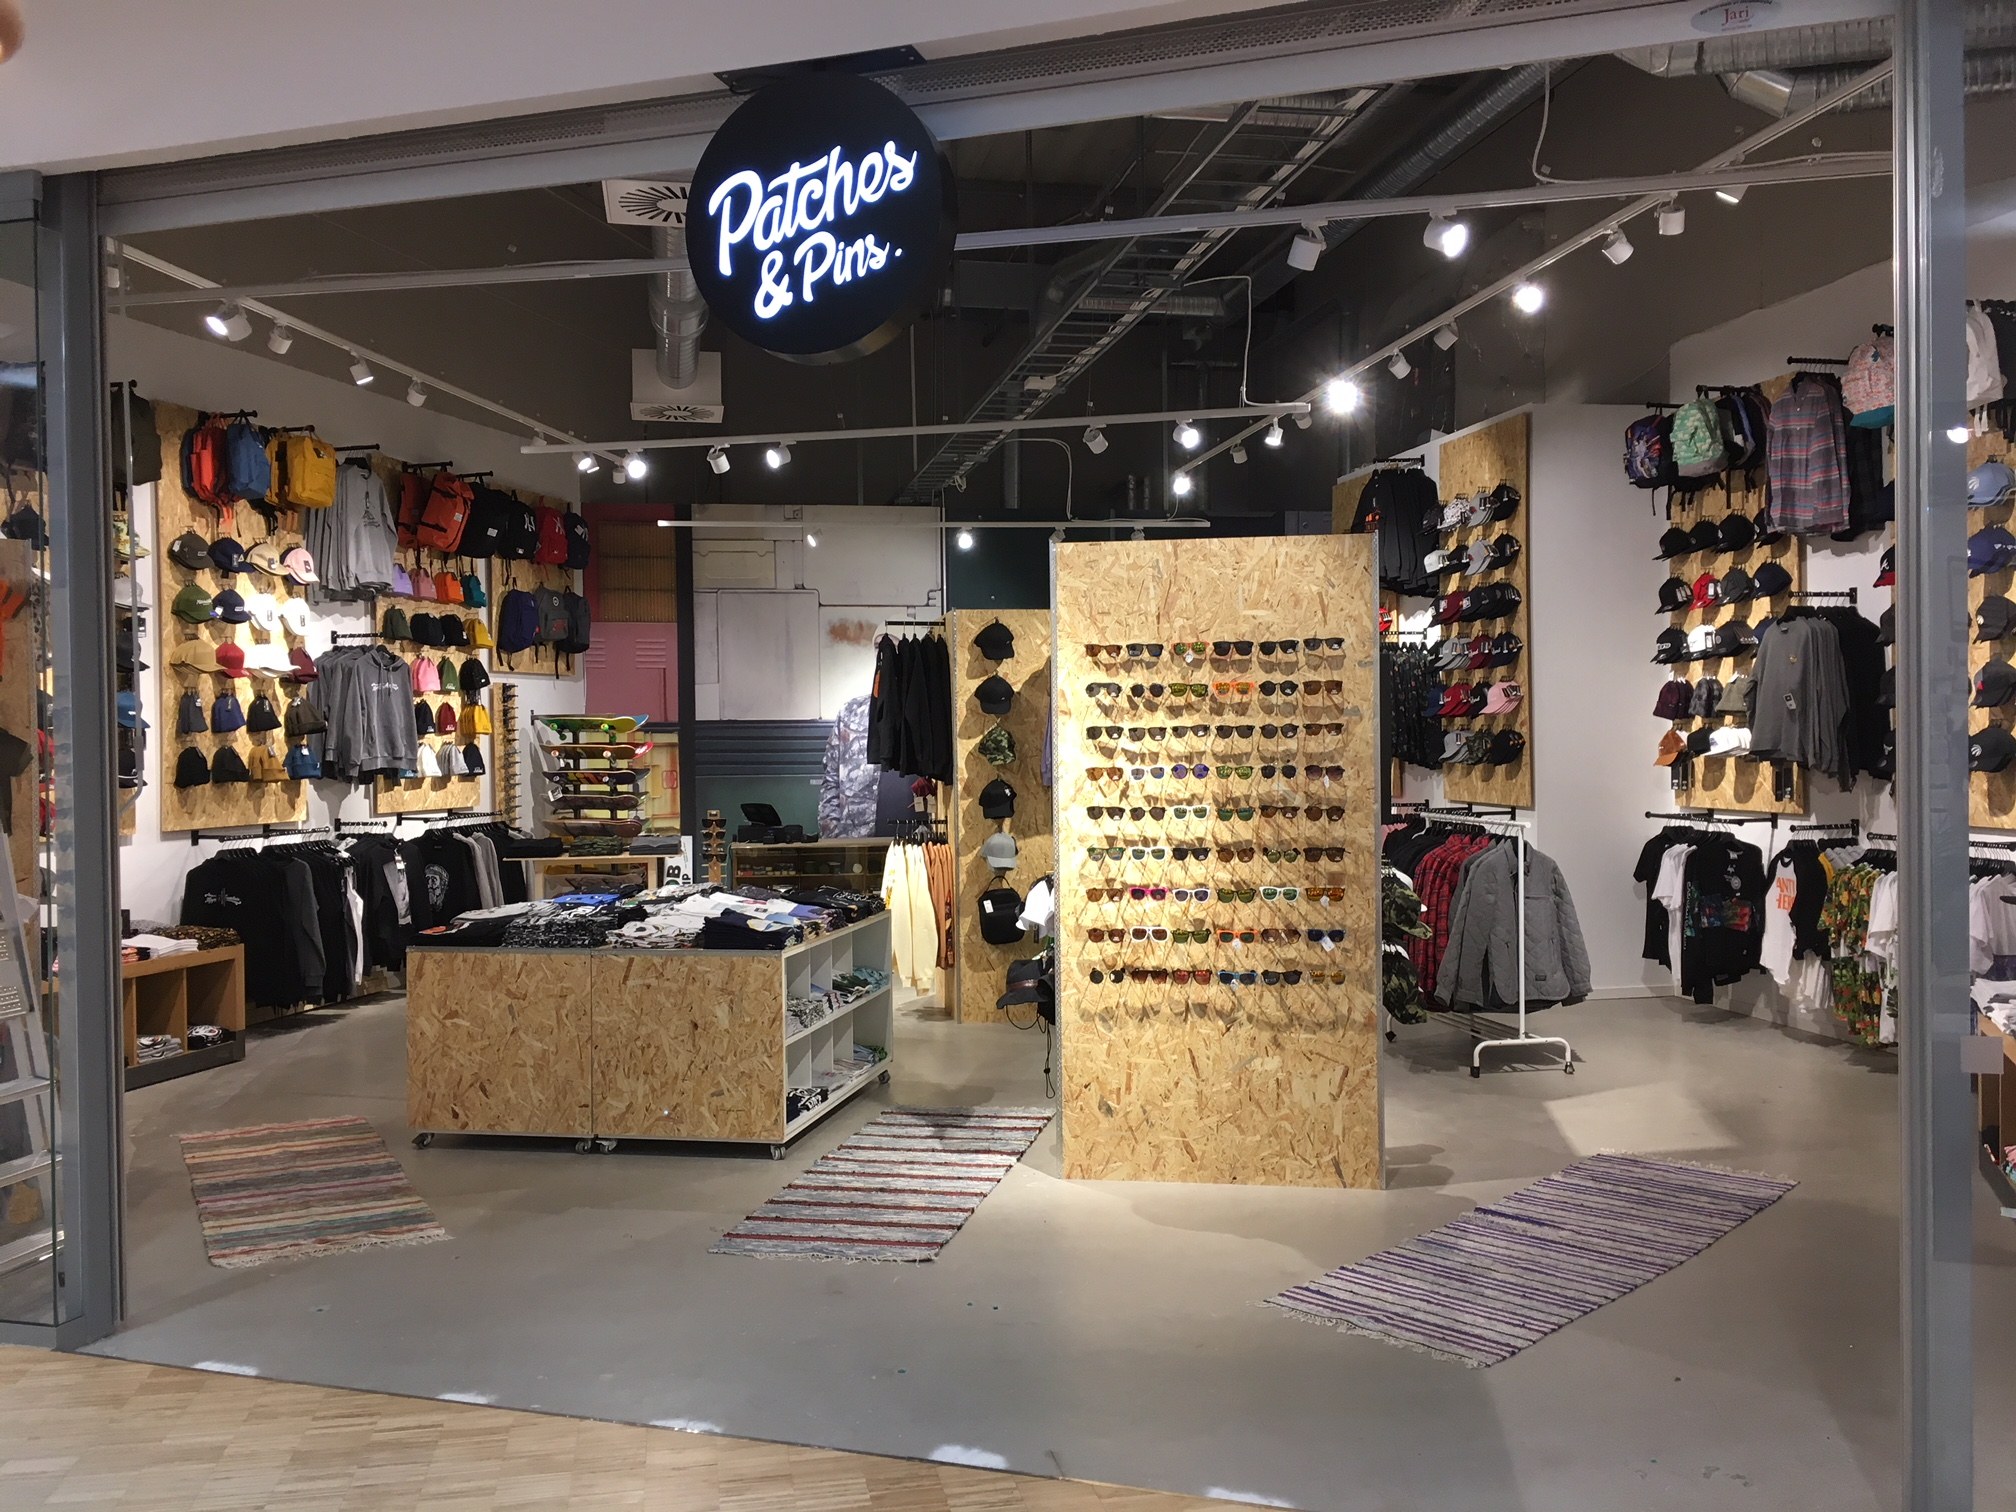 8bae40e9f7a Tredje butiken för Patches & Pins - Habit